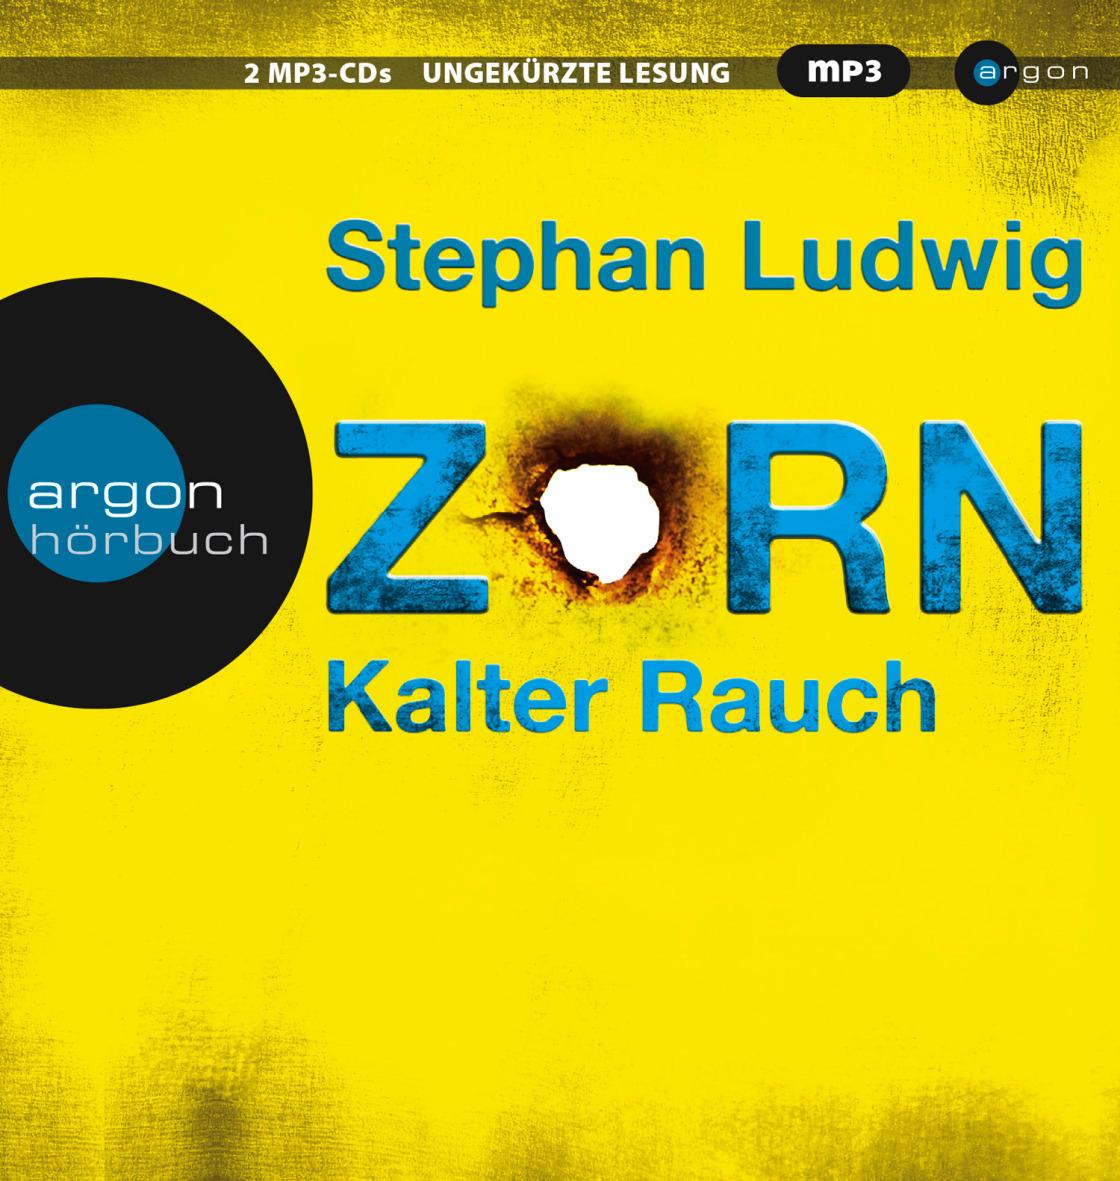 Zorn: Band 5 - Kalter Rauch - Stephan Ludwig [2 mp3 CDs]